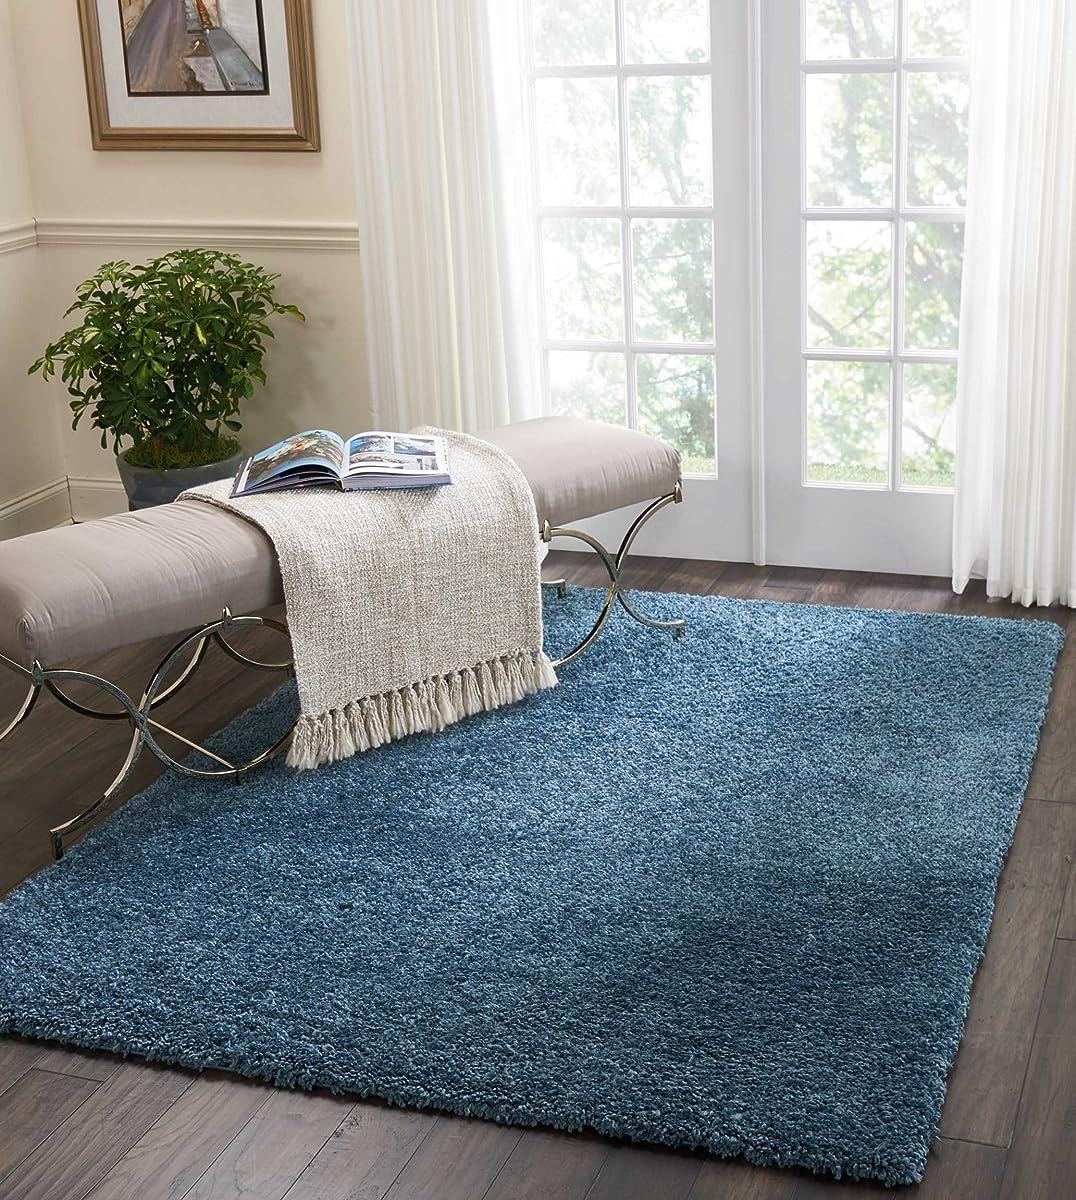 Nourison MSG01 Malibu Shag Area Rug, 53 x 73, BLUE